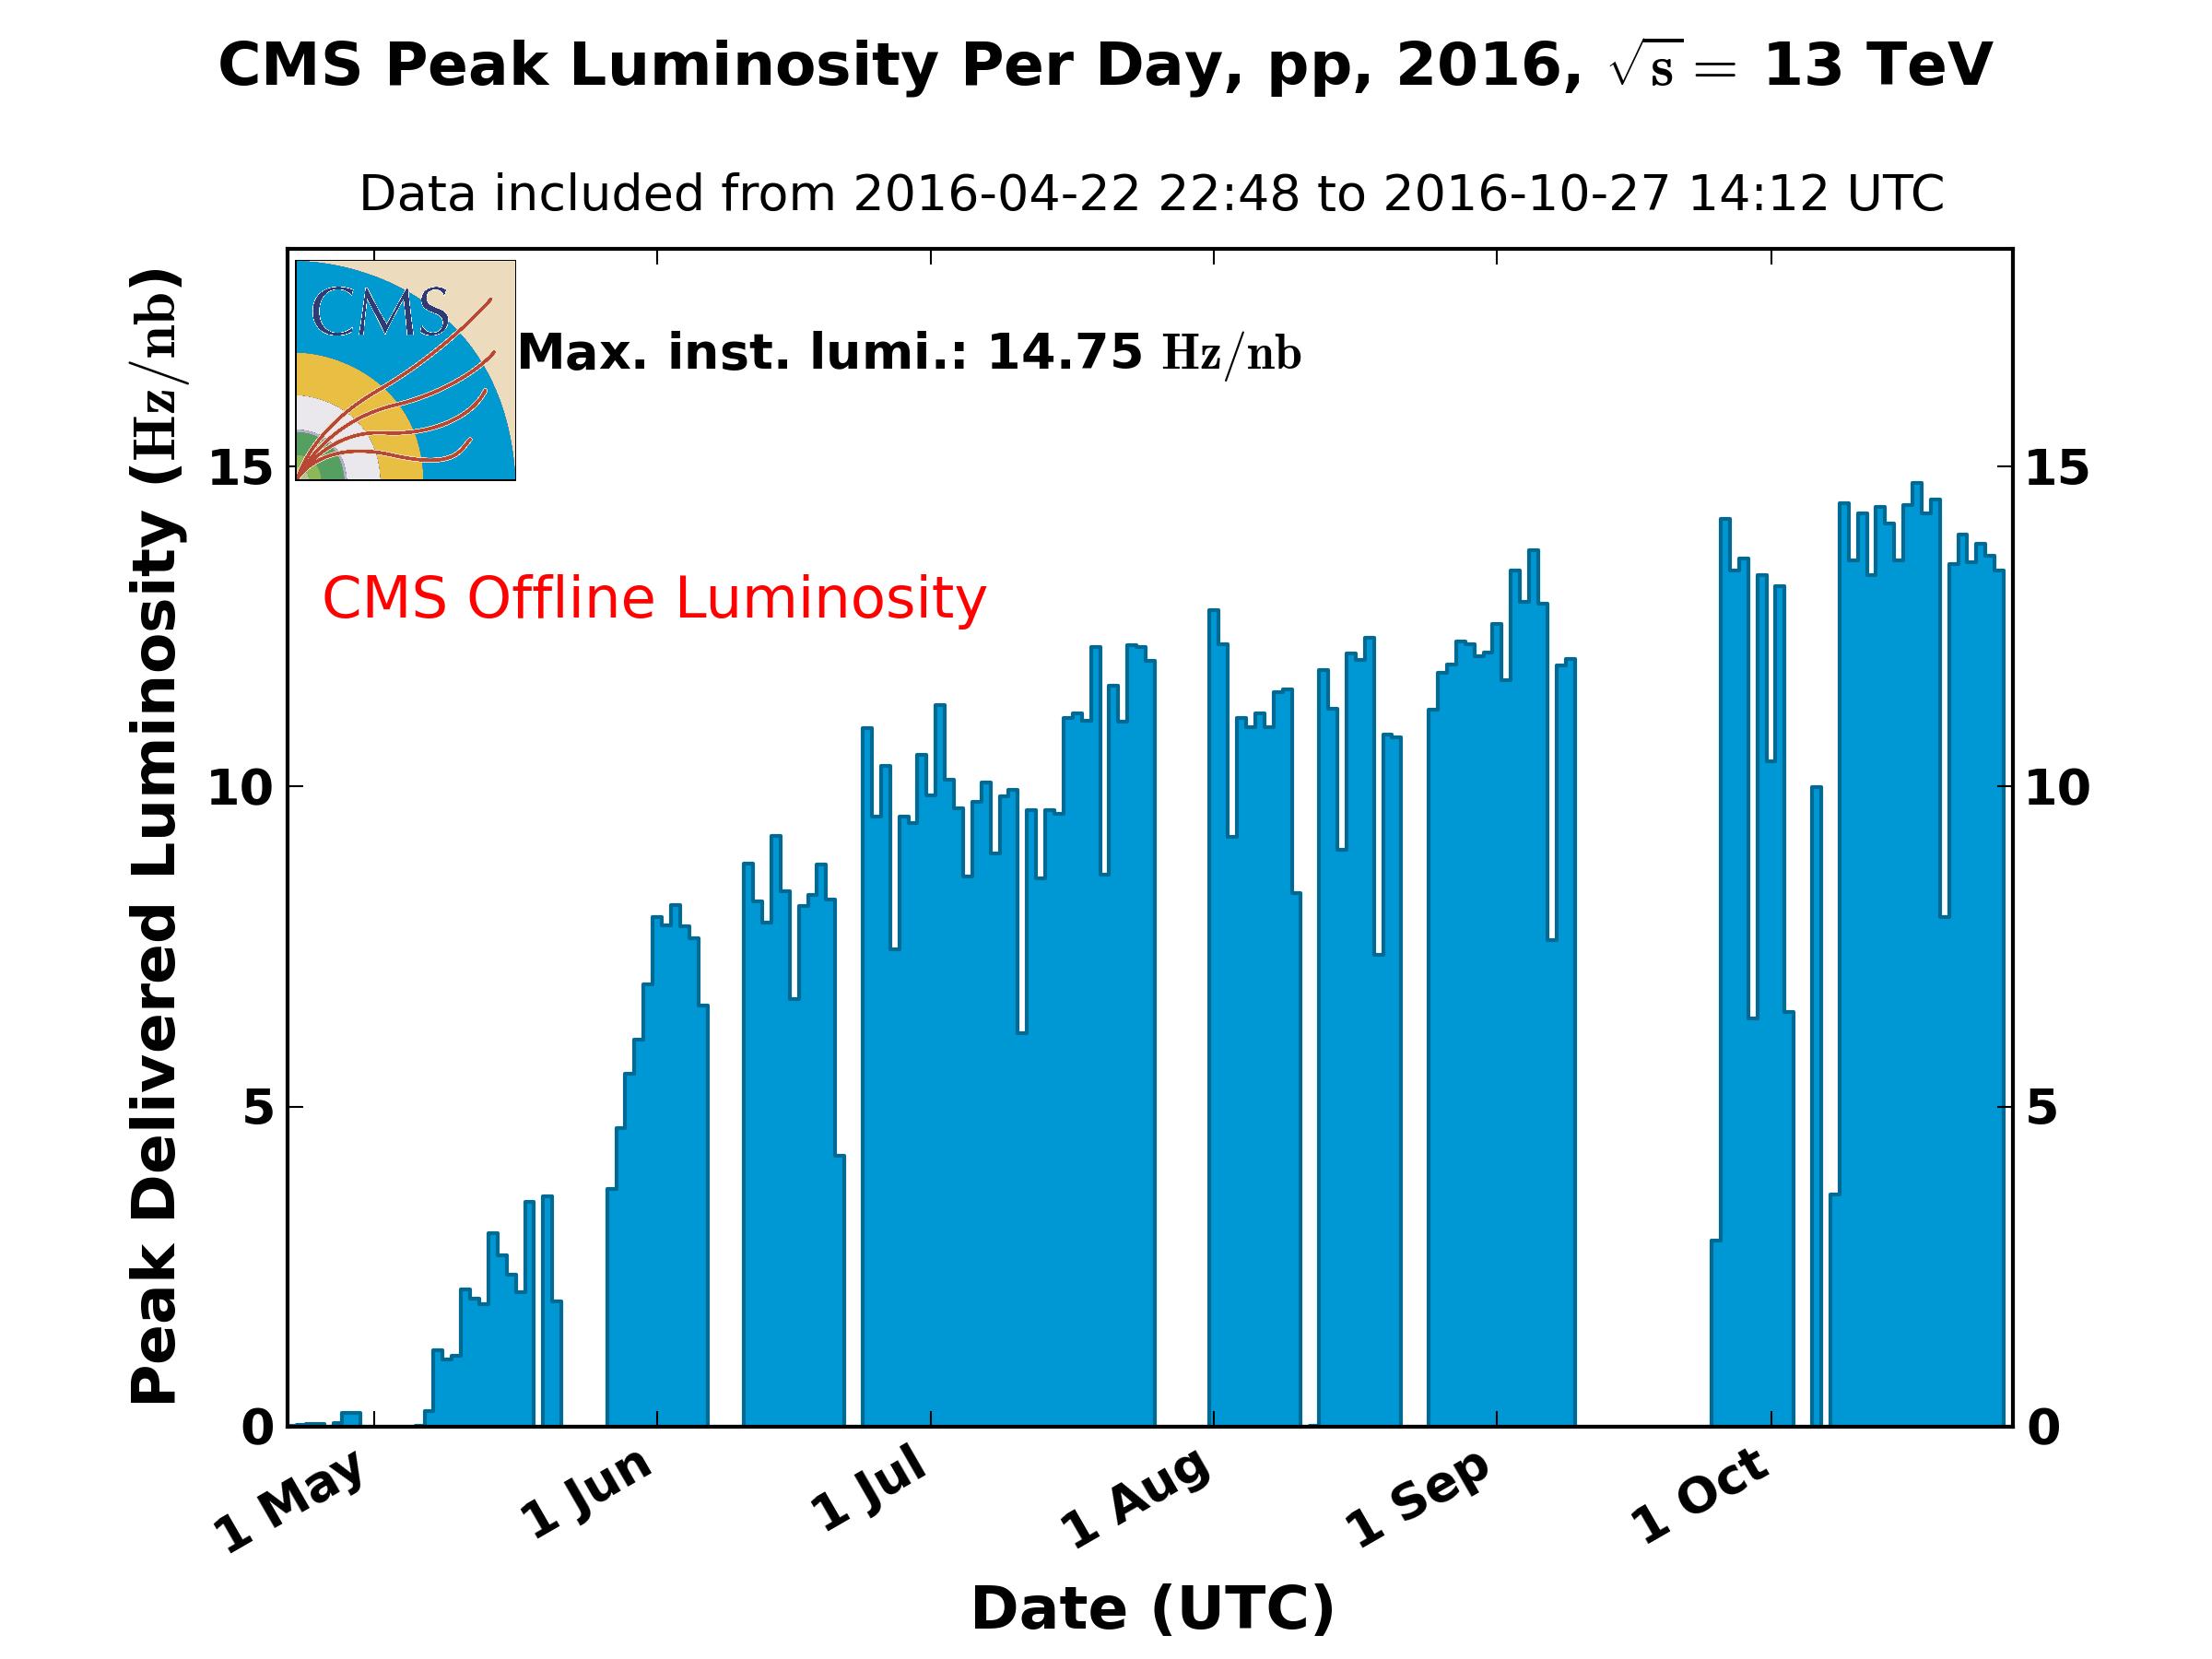 https://cern.ch/cmslumi/publicplots/peak_lumi_per_day_pp_2016.png